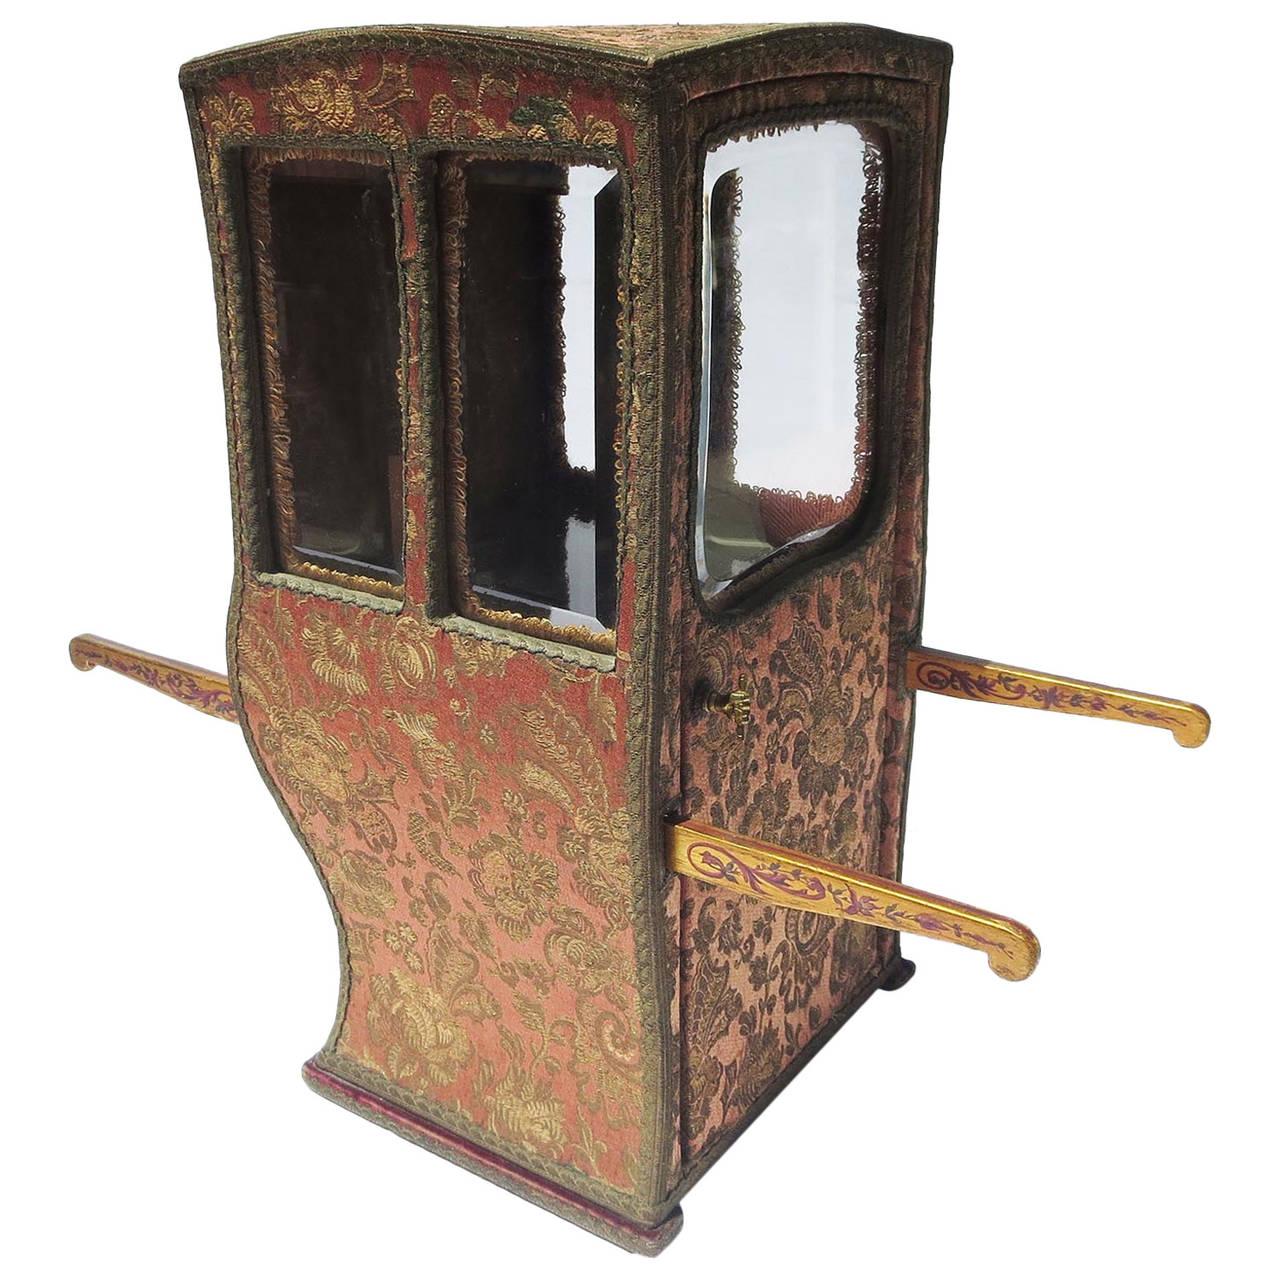 Hand Carried Chair >> Miniature Silk Sedan Chair Vitrine or Jewelry Case at 1stdibs